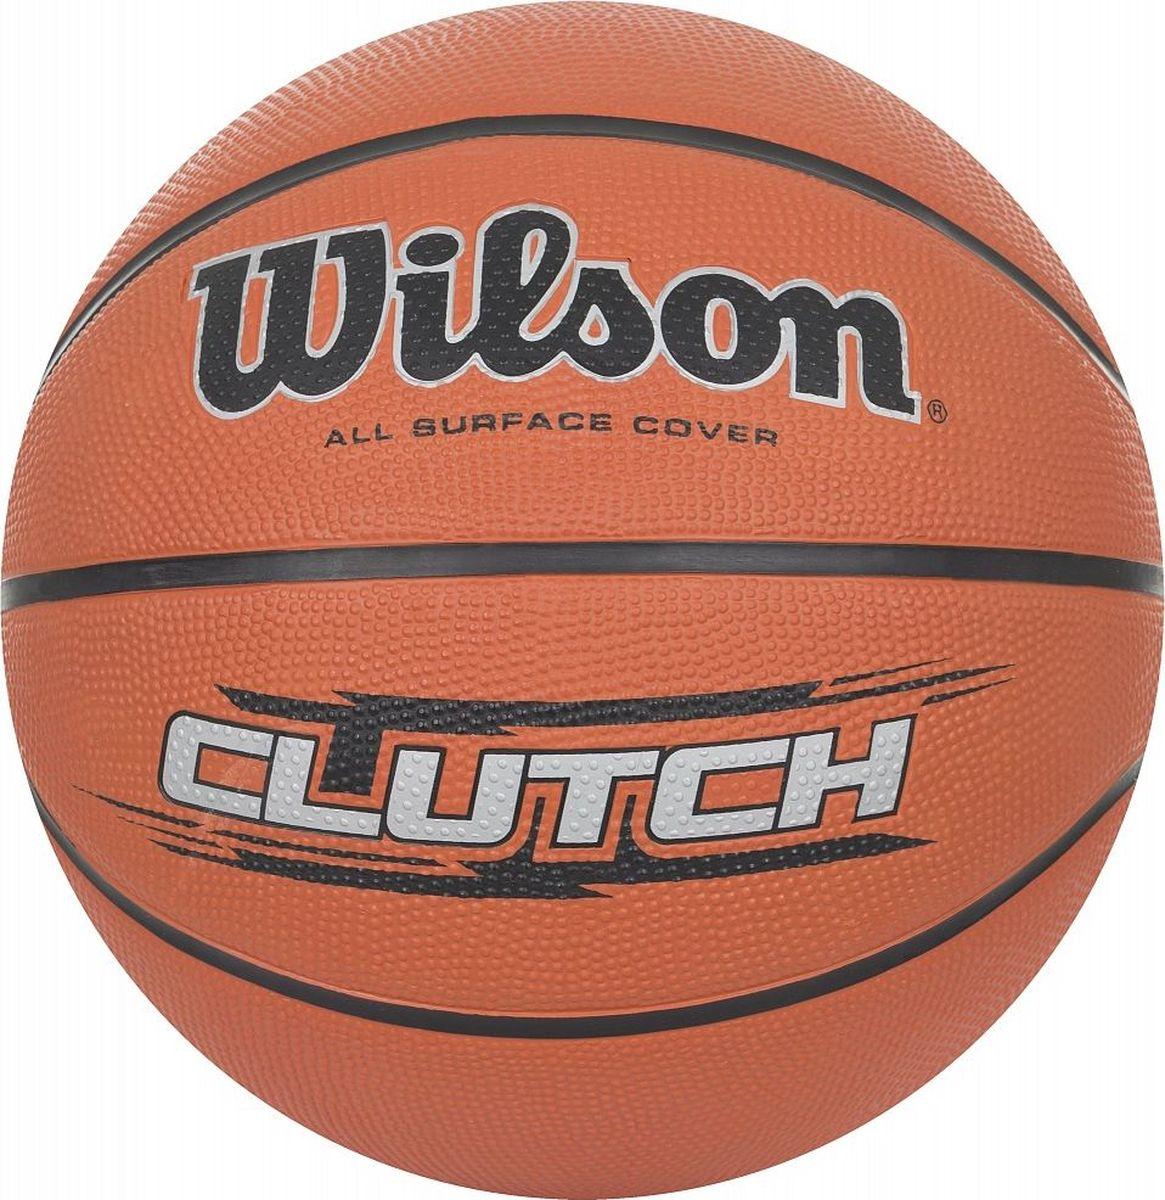 Мяч баскетбольный Wilson  Clutch . Размер 7 - Баскетбол